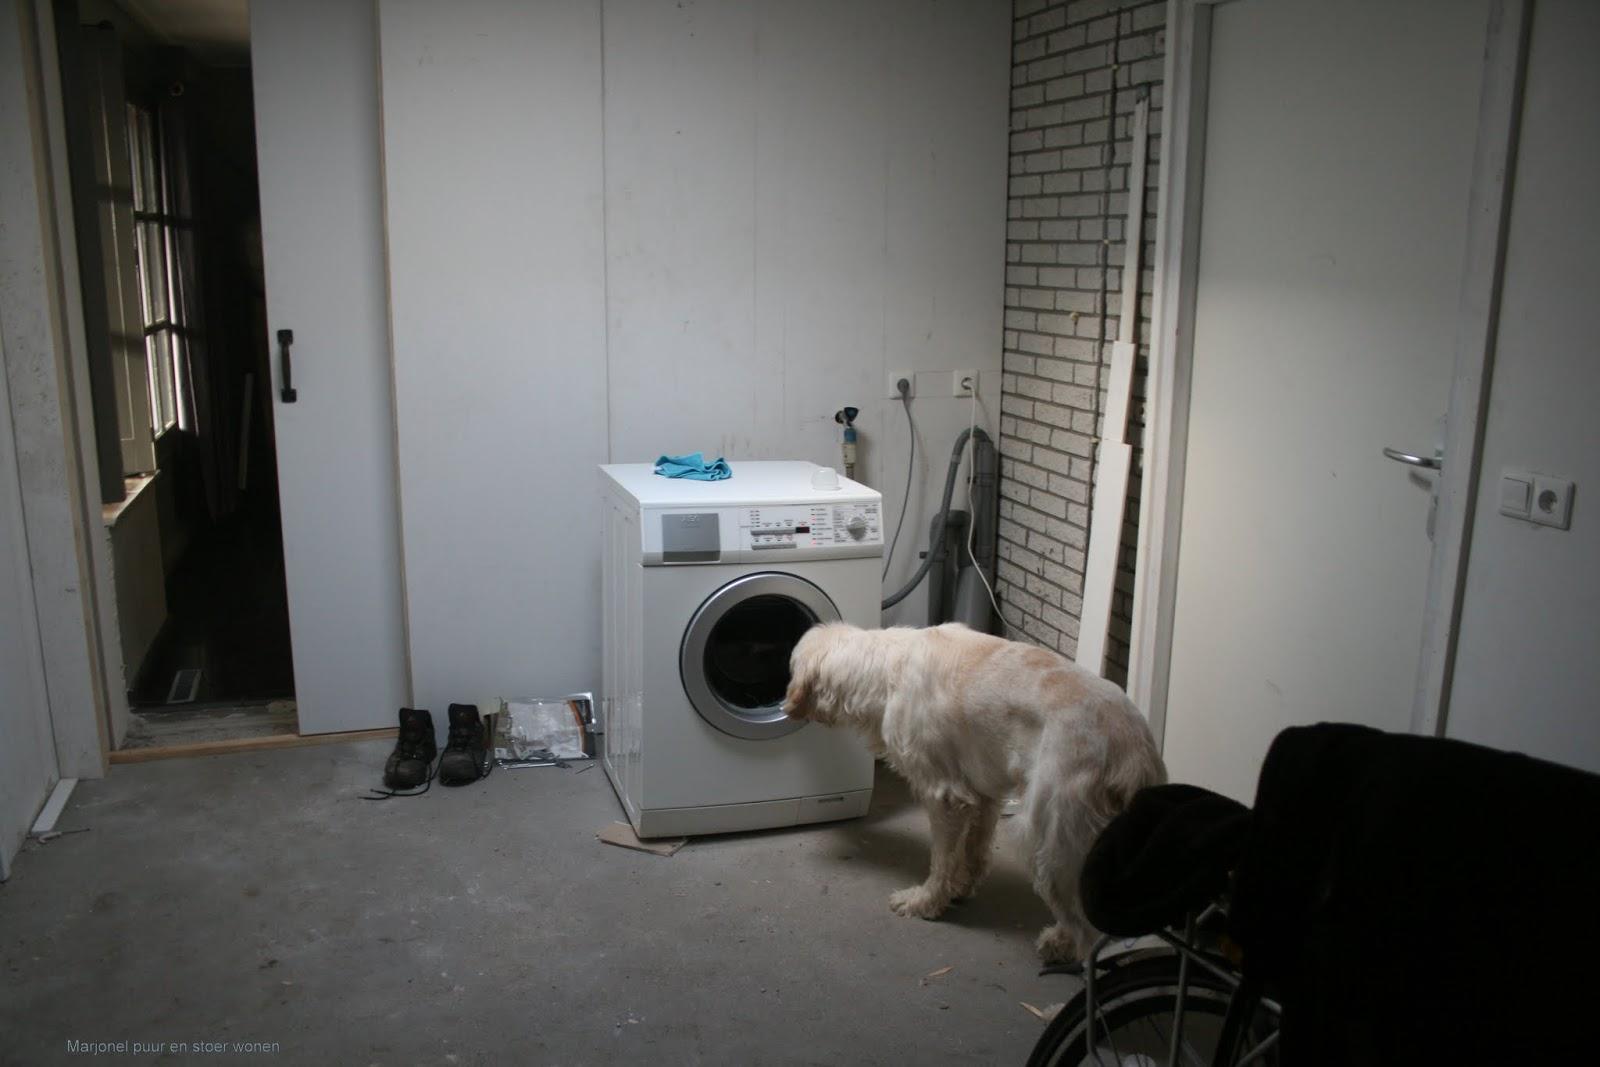 Wasmachine Wasdroger Kast: Diy wasmachine ombouw inspiraties ...